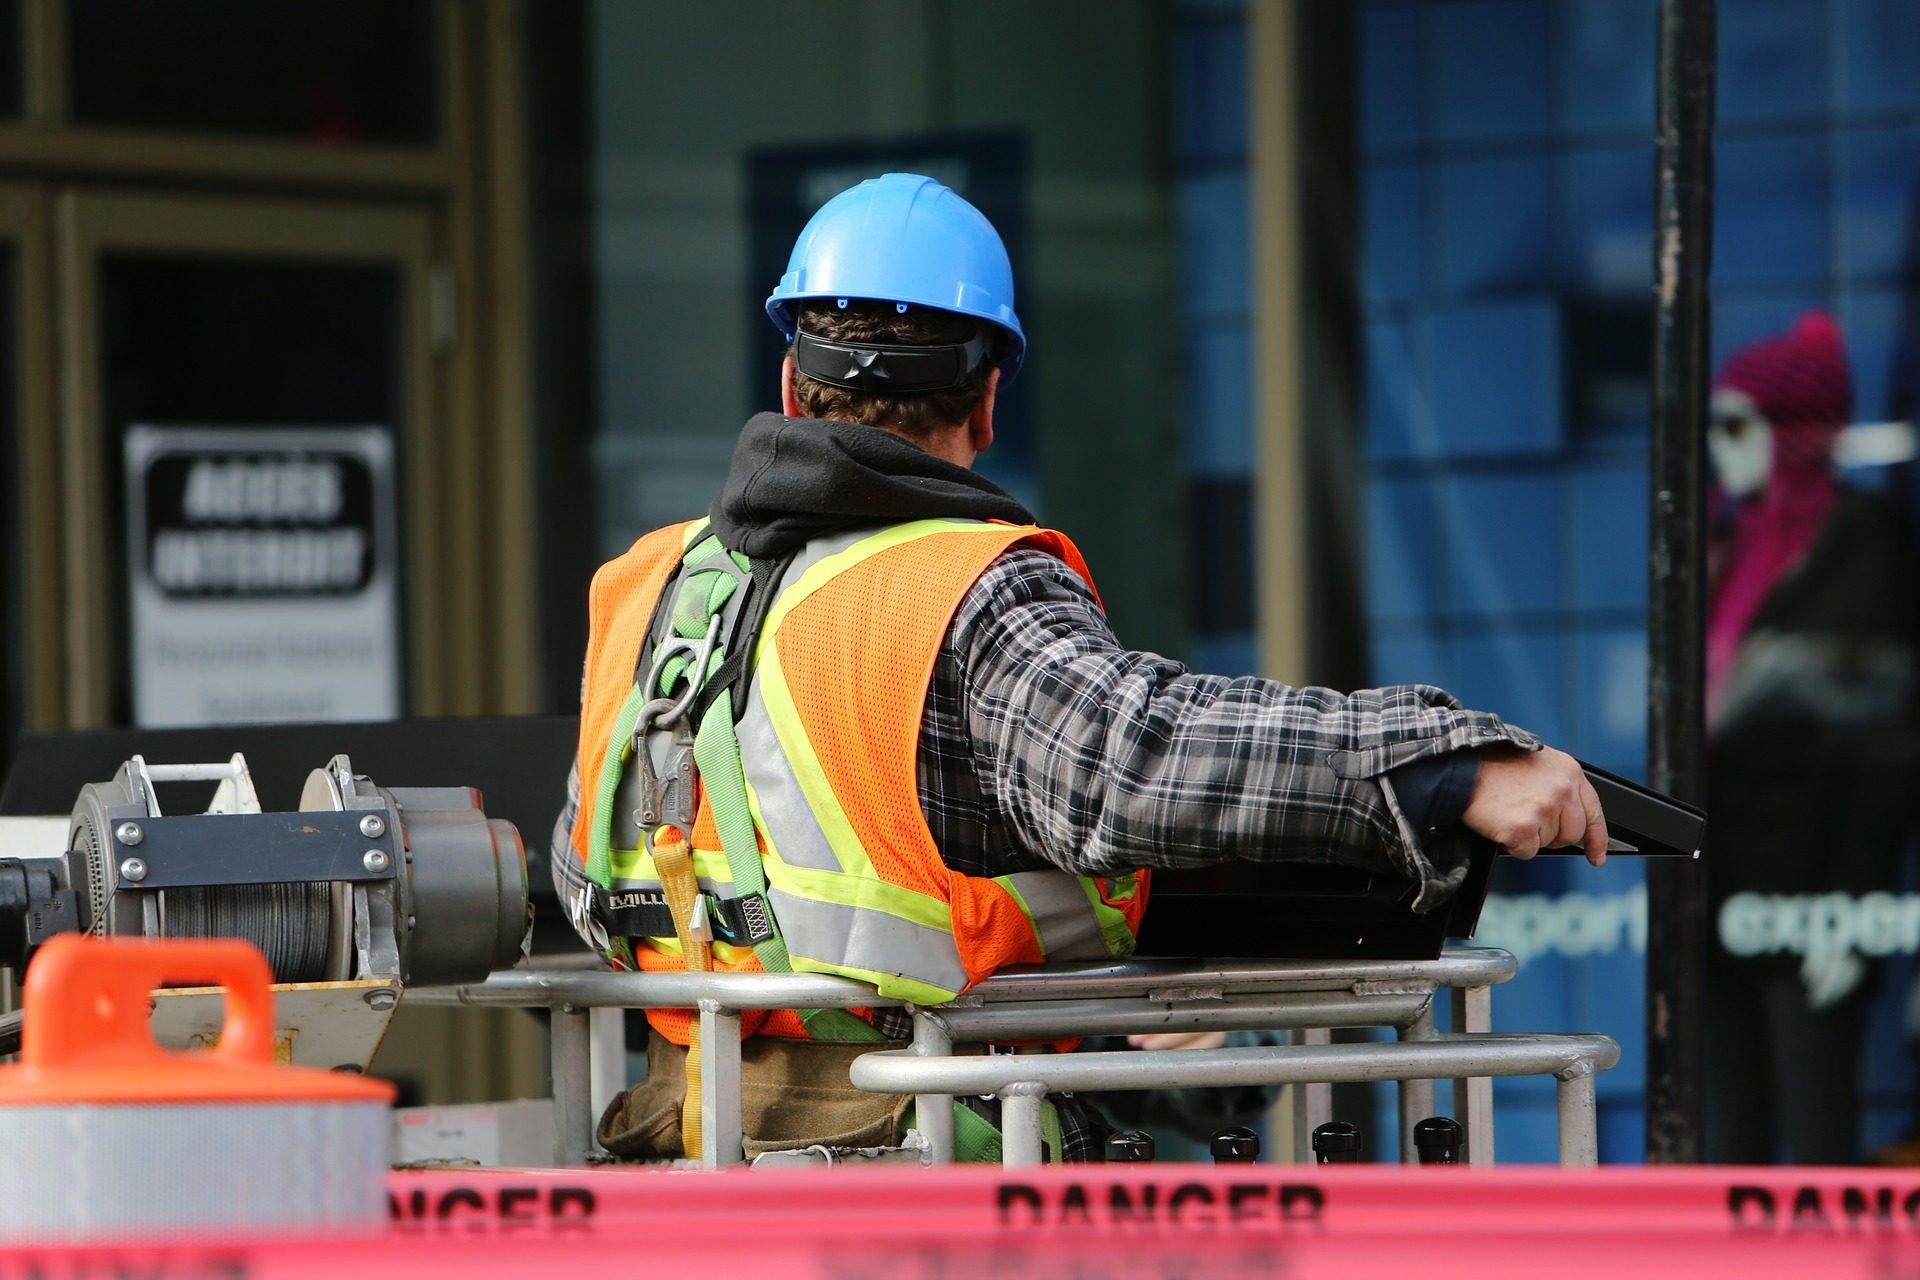 obrero, κατασκευή, trabajador, εργασία, κράνος, protección - Wallpapers HD - Professor-falken.com